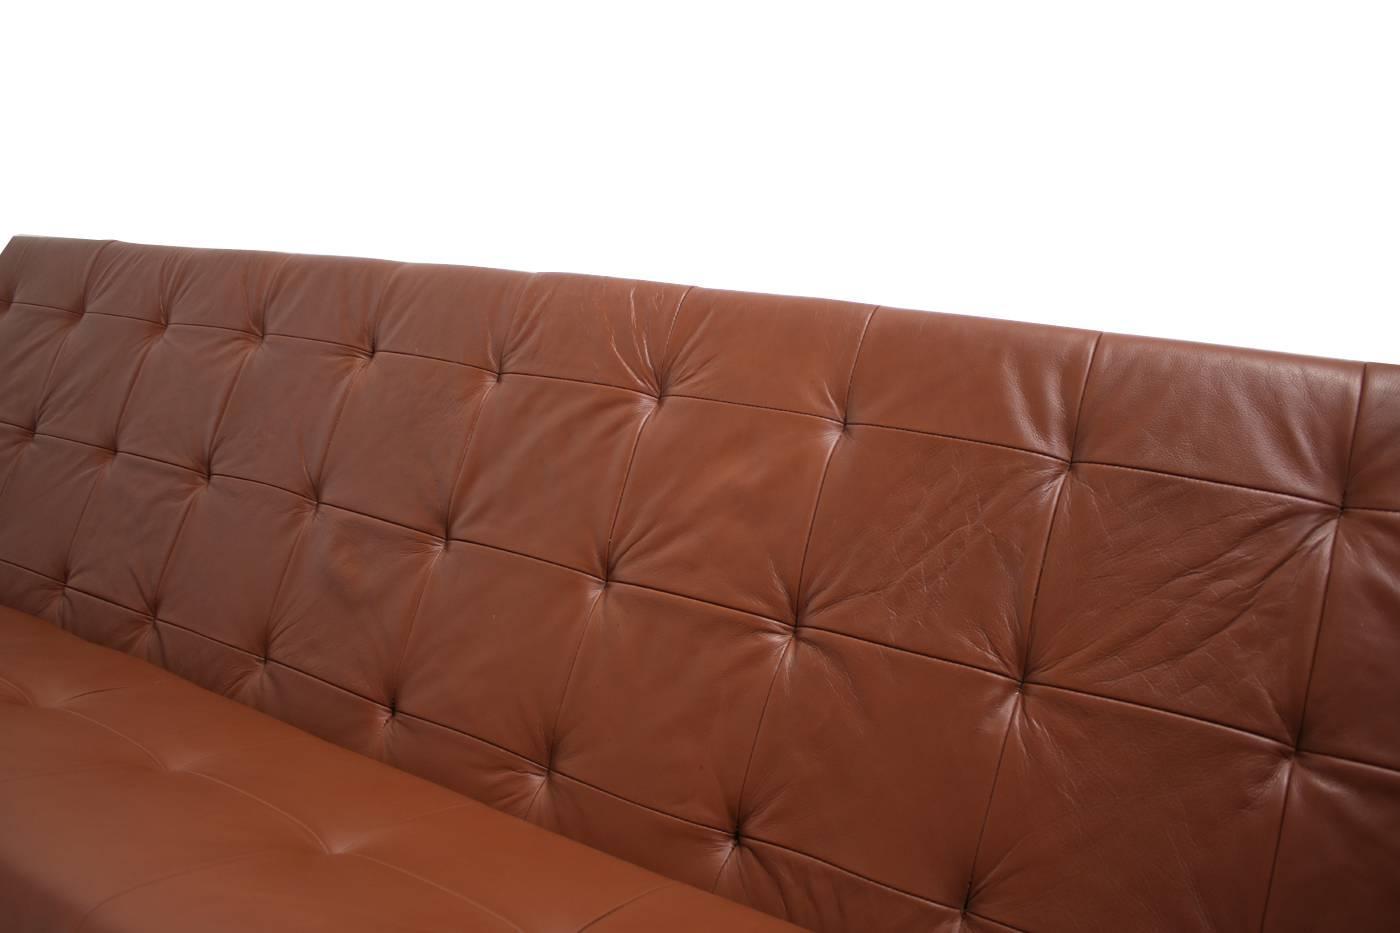 Sofa Leder Cognac dprmodelscom Es geht um Idee Design  : sofadaybedknollleder008z from www.dprmodels.com size 1400 x 933 jpeg 54kB